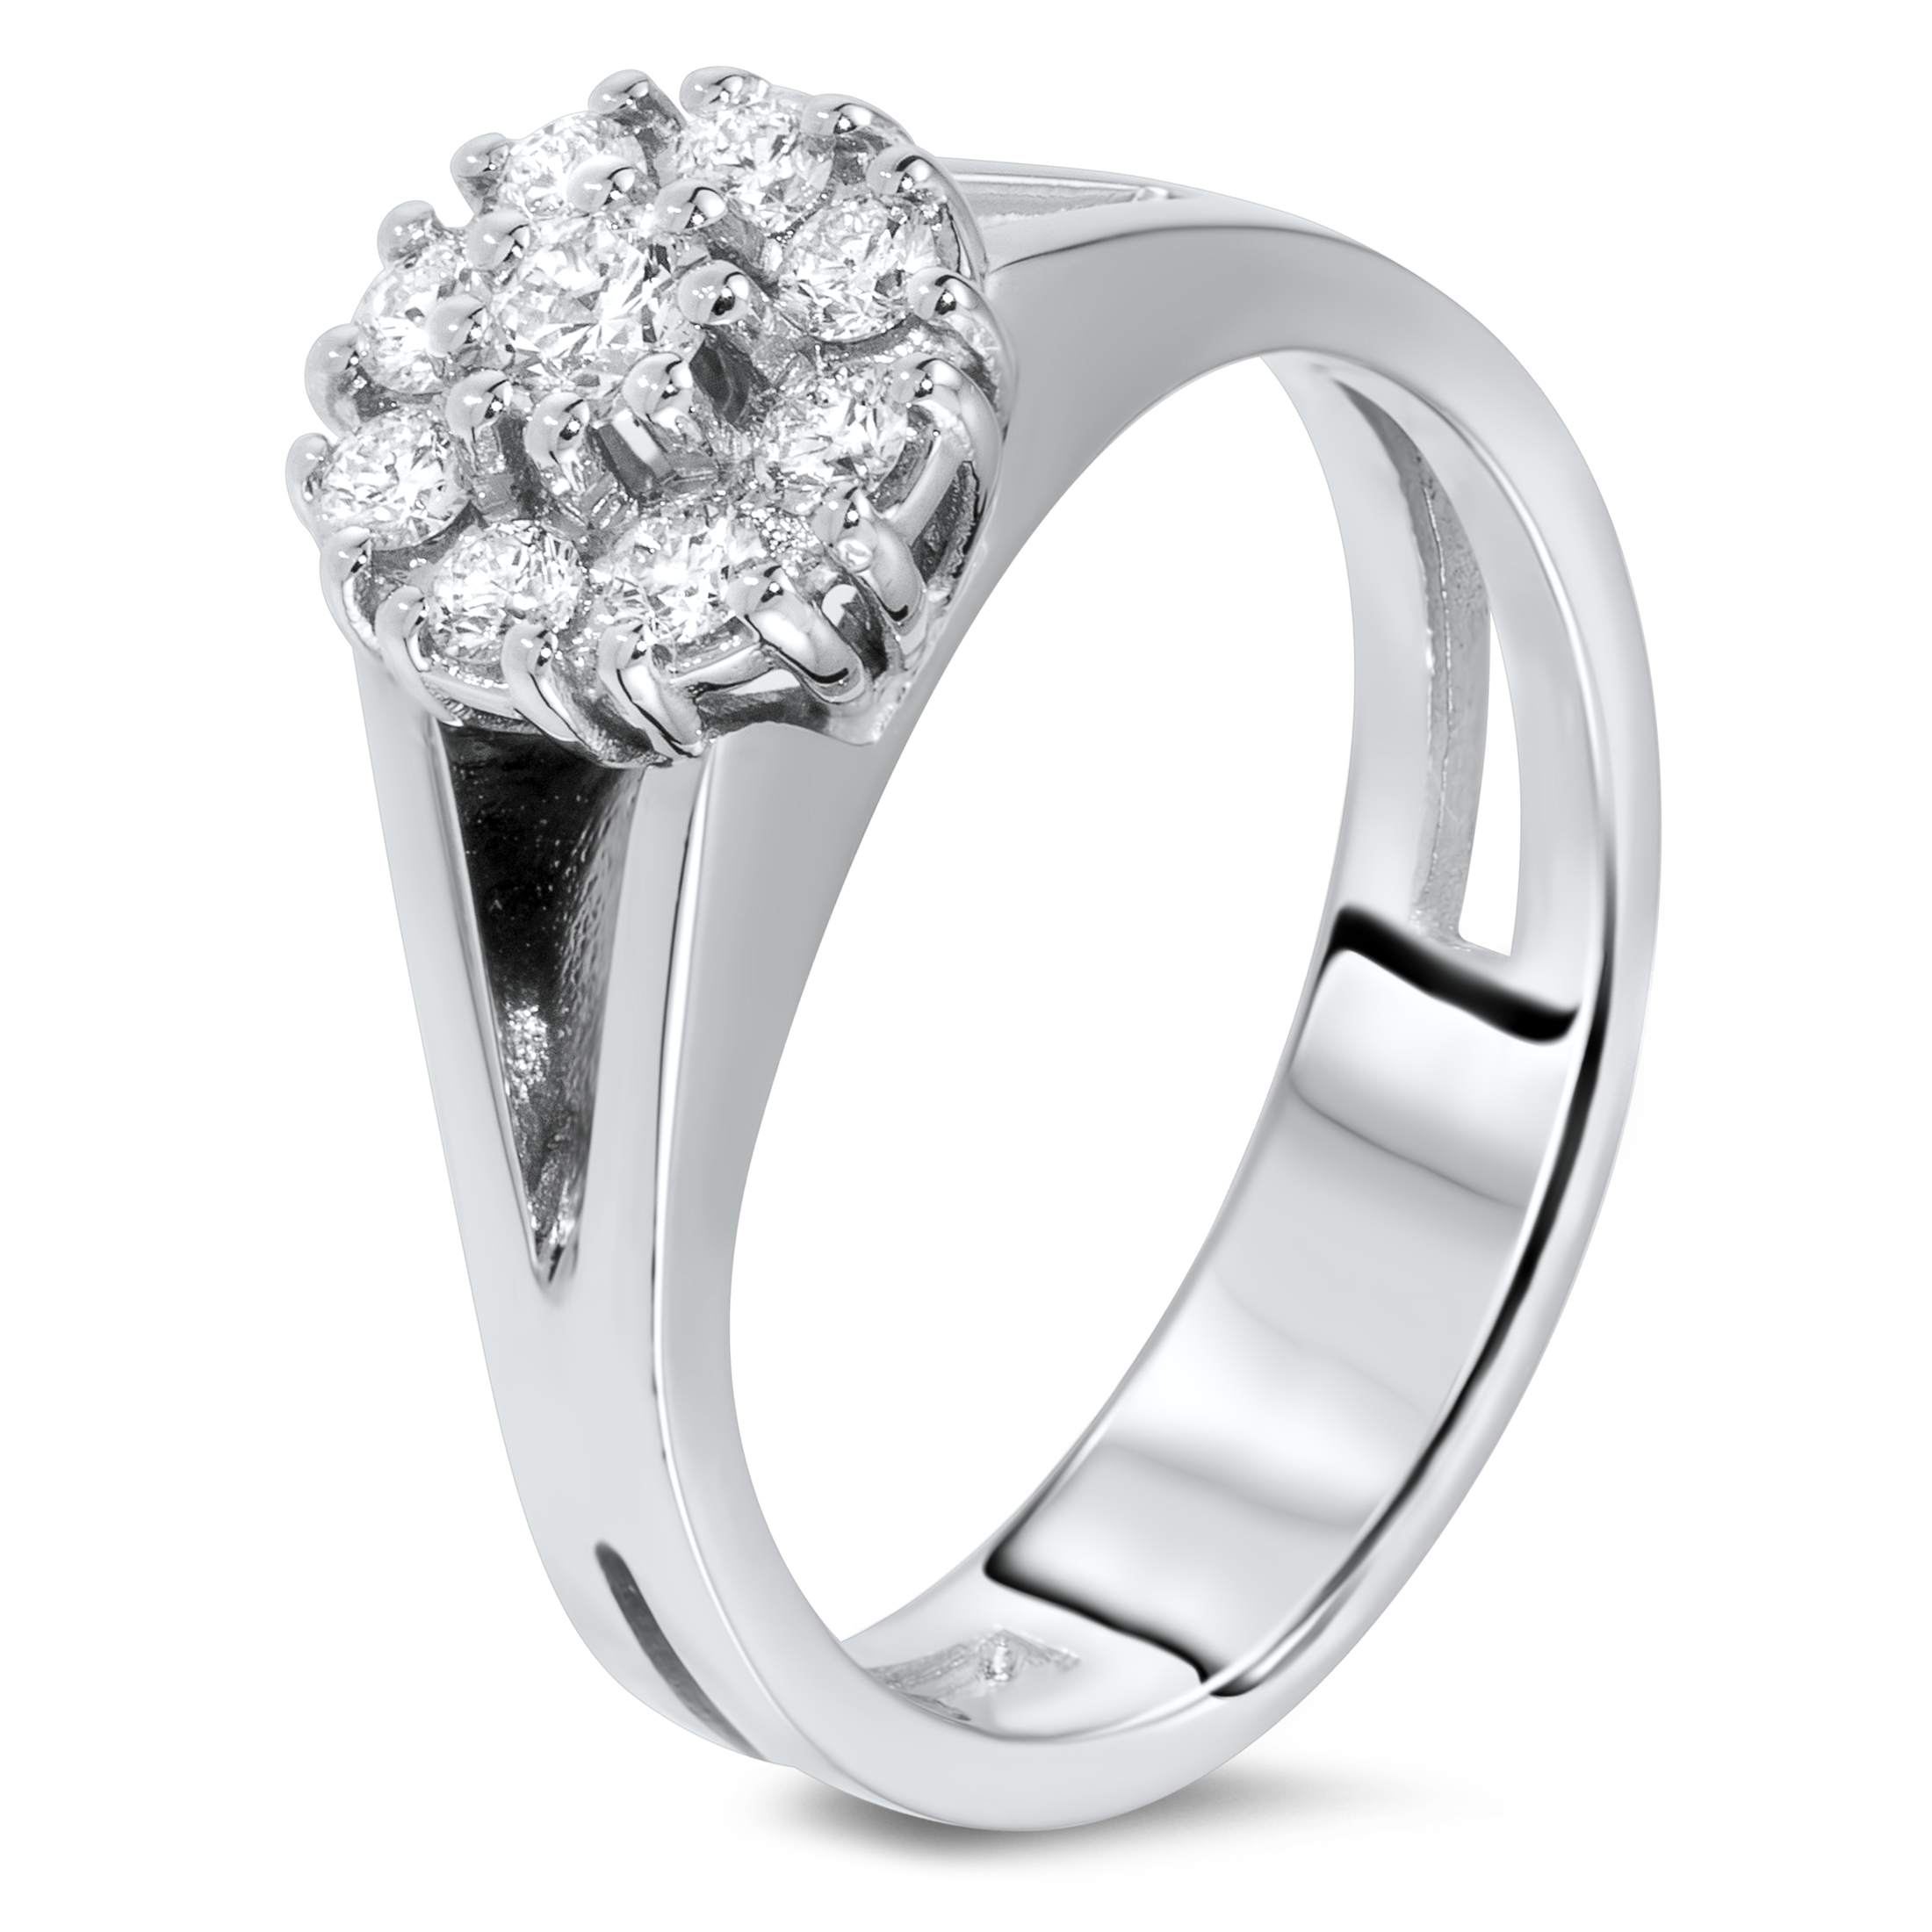 Diamond ring in 18k white gold.